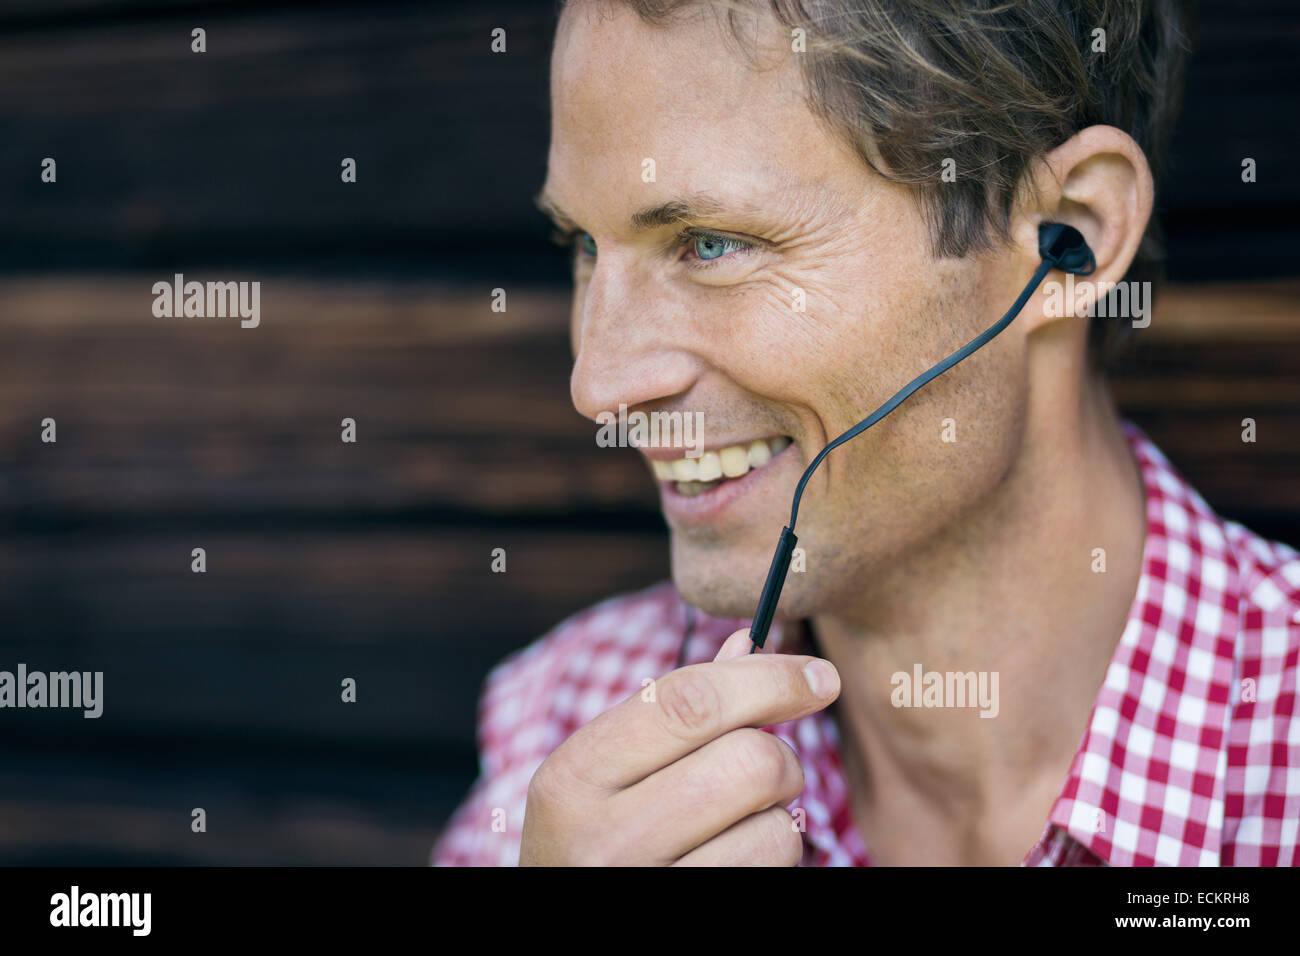 Hombre feliz con dispositivo manos libres fuera de cabaña Imagen De Stock